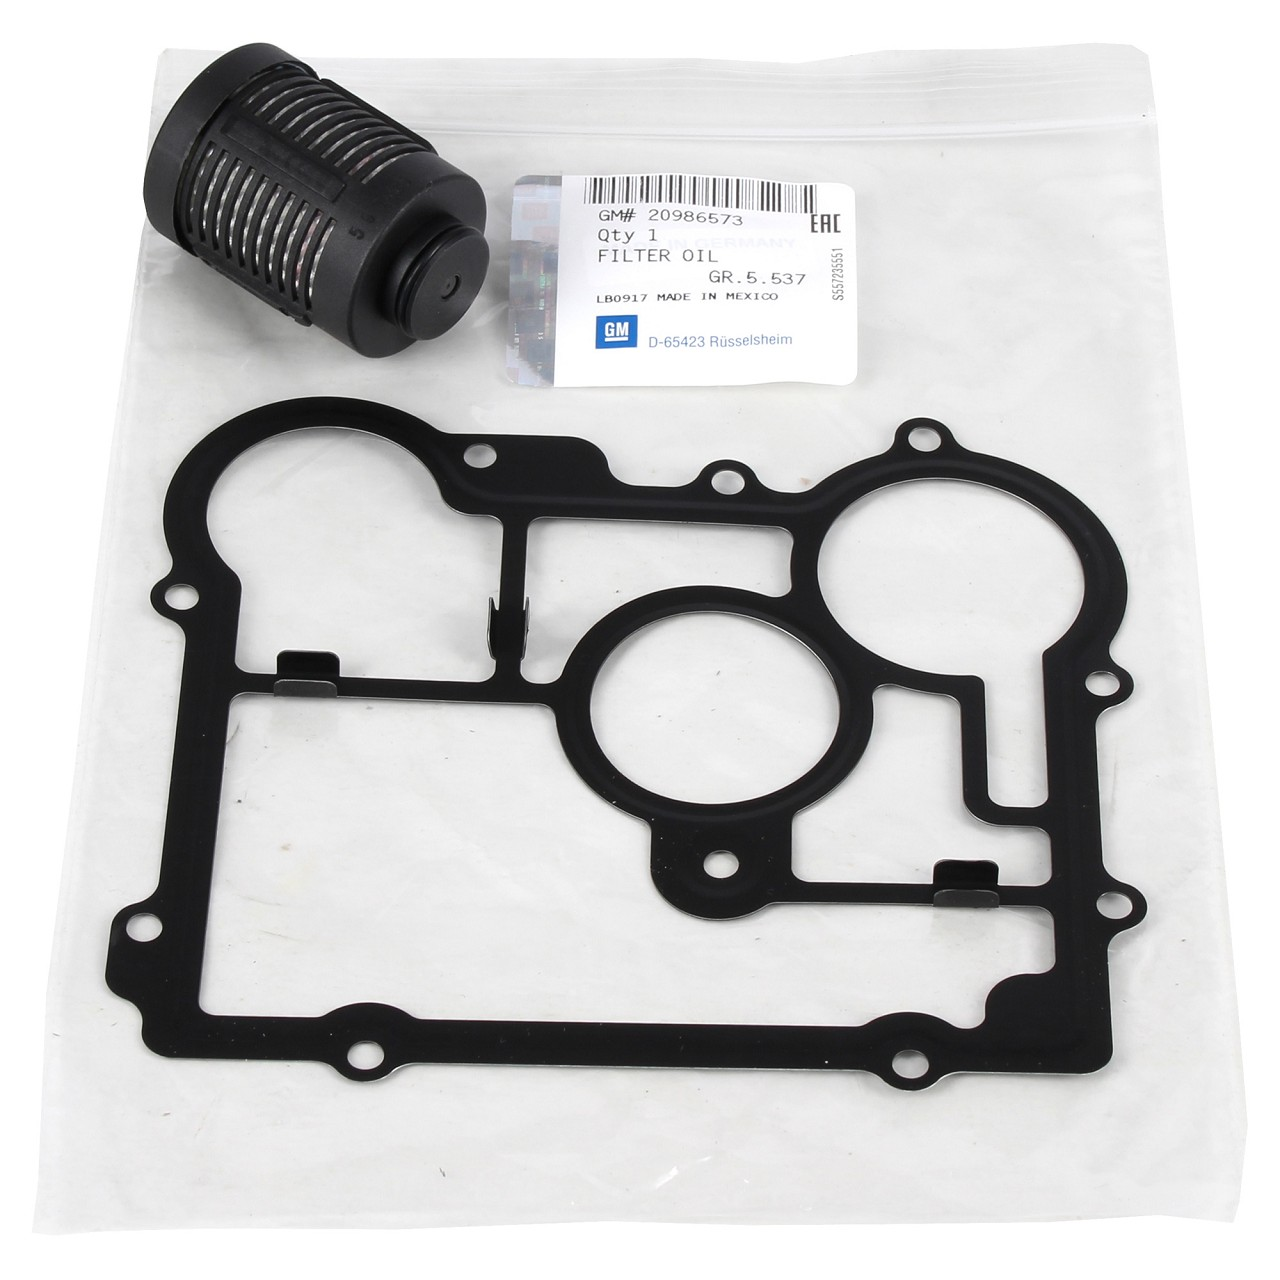 ORIGINAL Opel Ölfilter + Dichtung Ausgleichsgetriebe HINTERACHSE 20986573